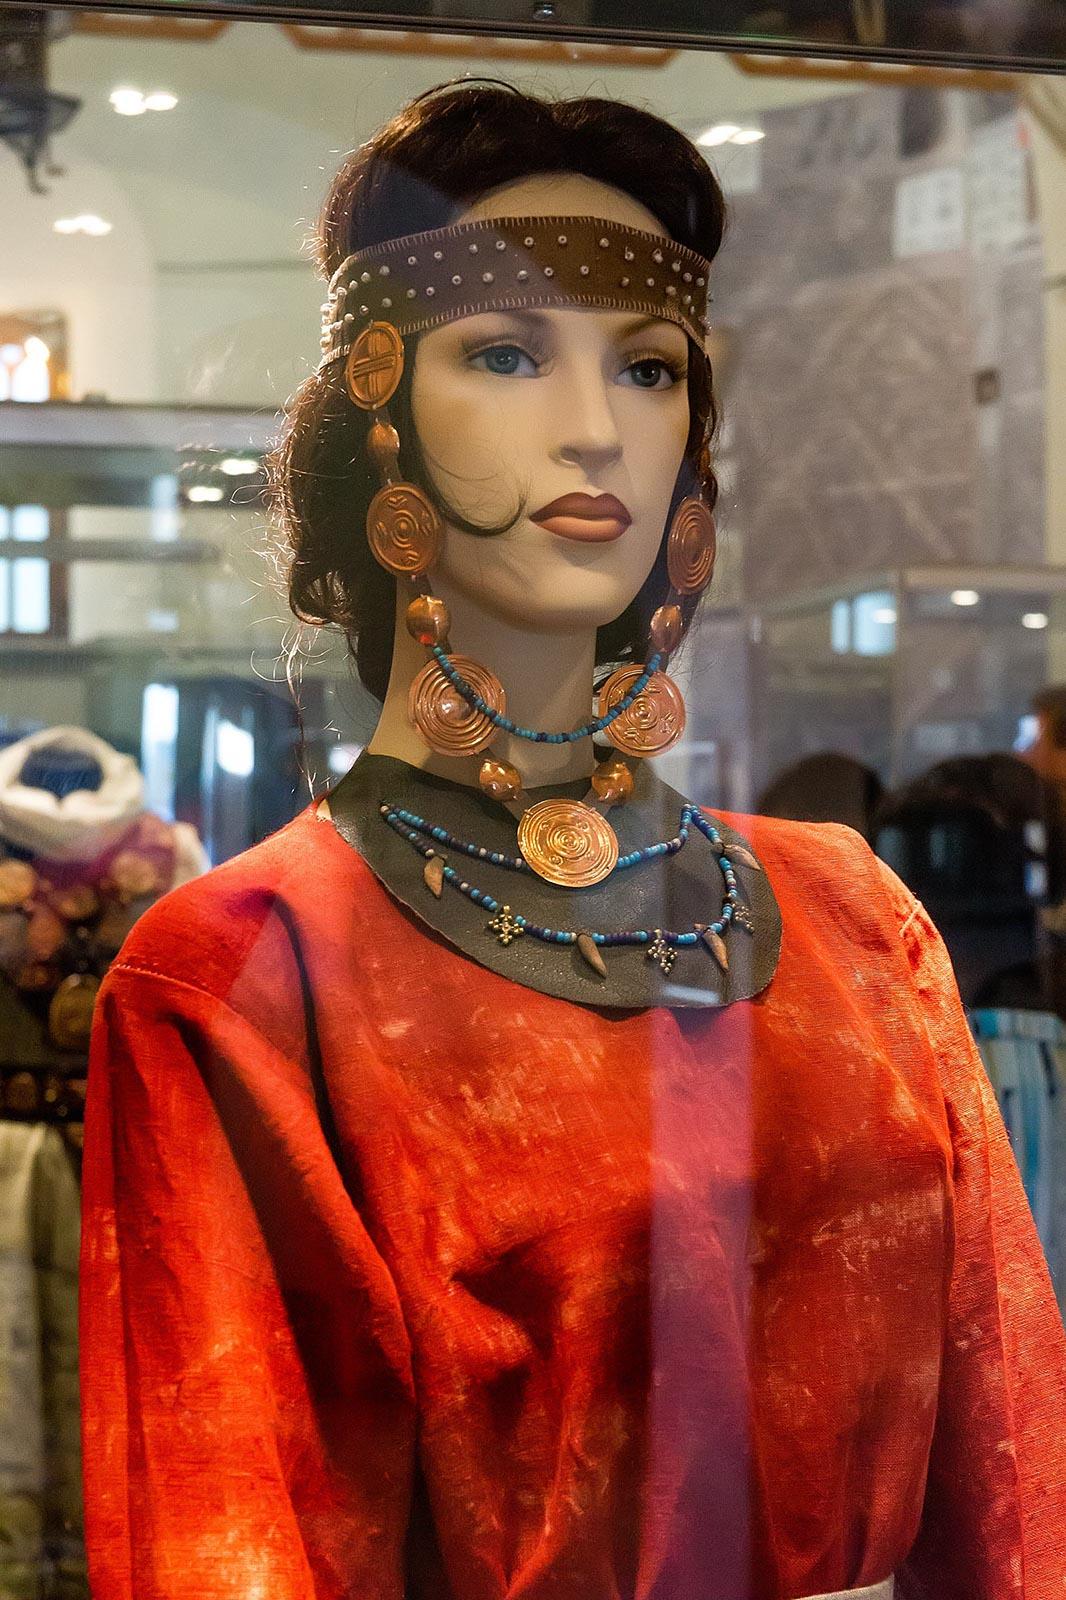 Фото №181837. Реконструкция женского костюма эпохи бронзы. Автор р. Е.В.Куприянова